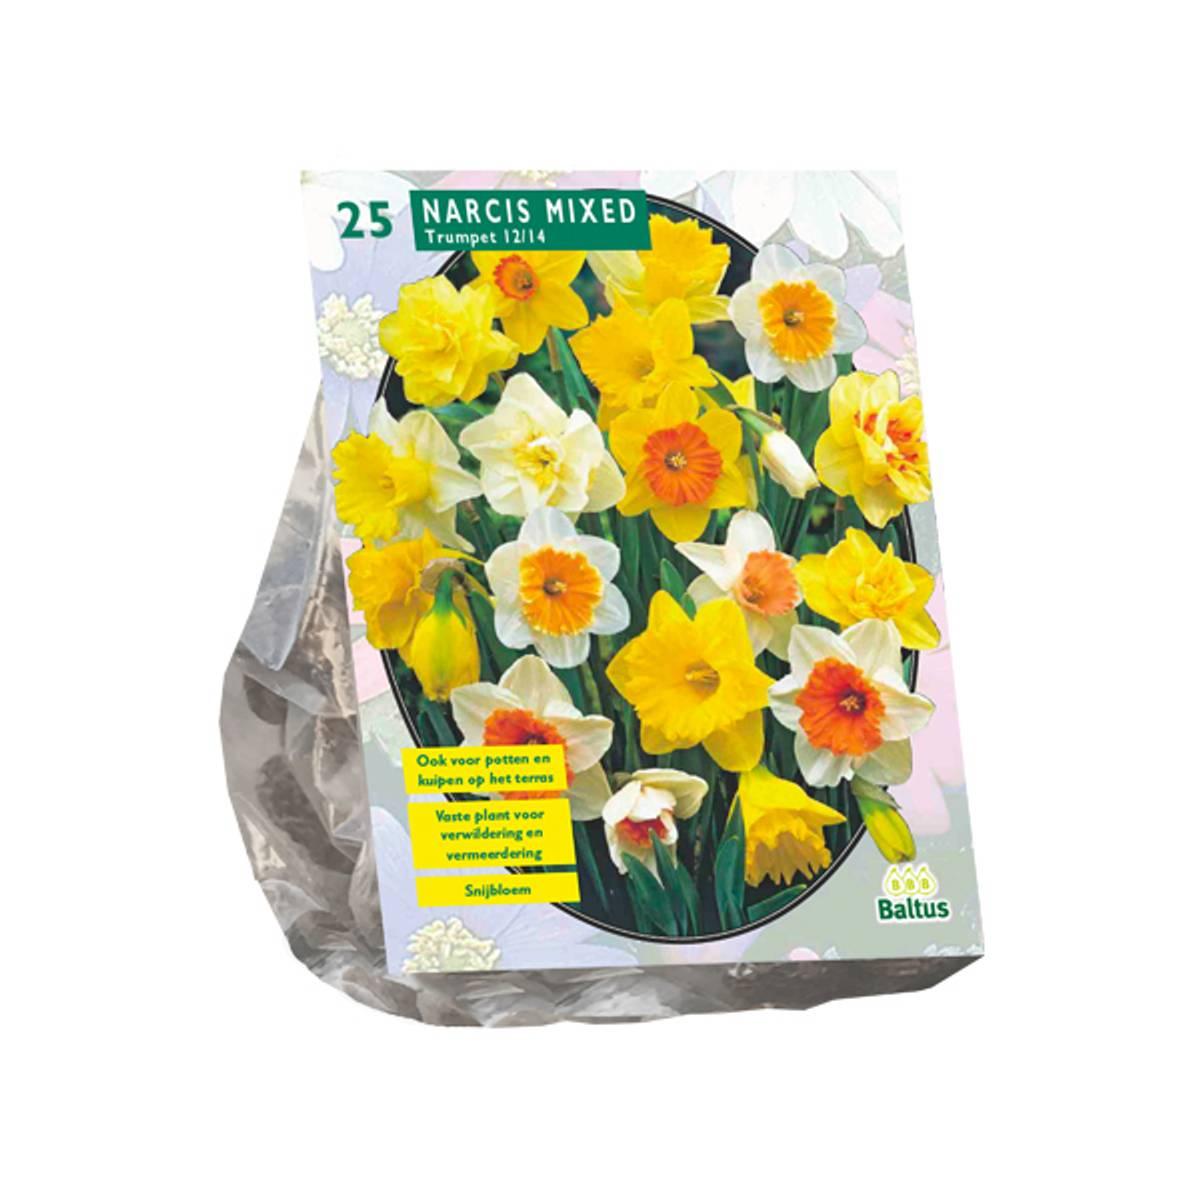 Narcis 'Trompet, Mix' - 25 stk. blomsterløk av påskelilje